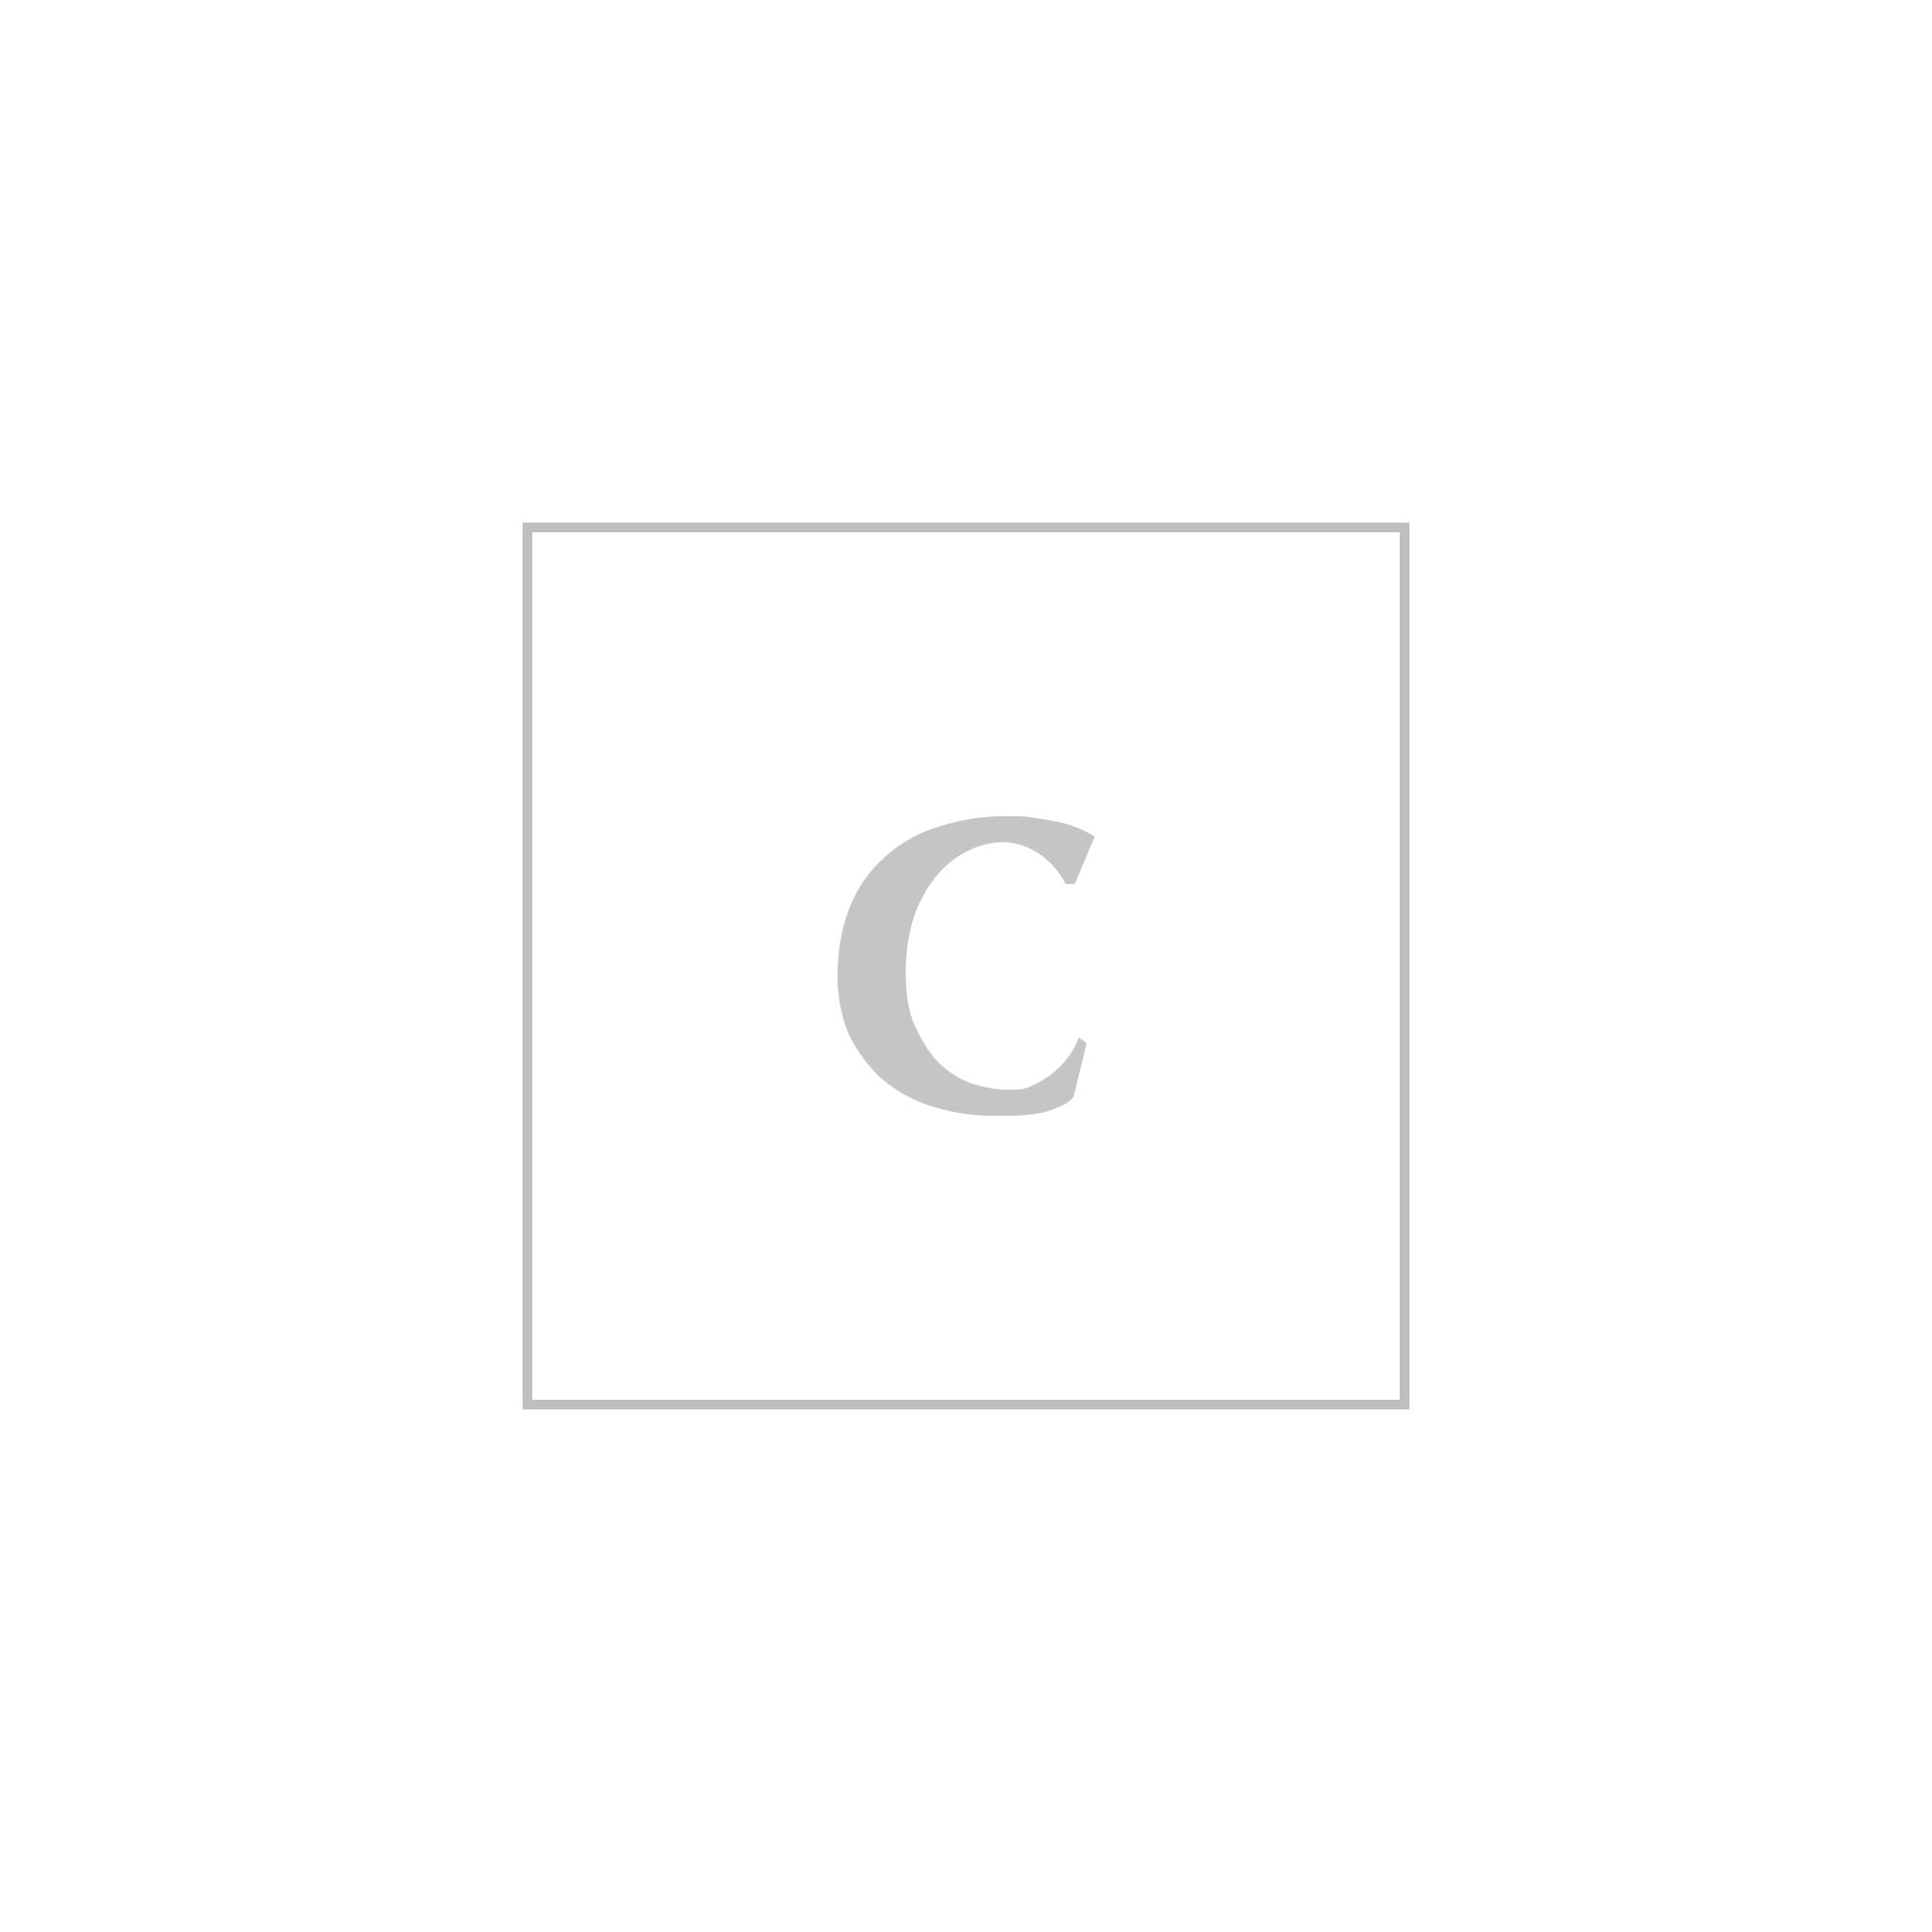 Burberry portafoglio idbillf